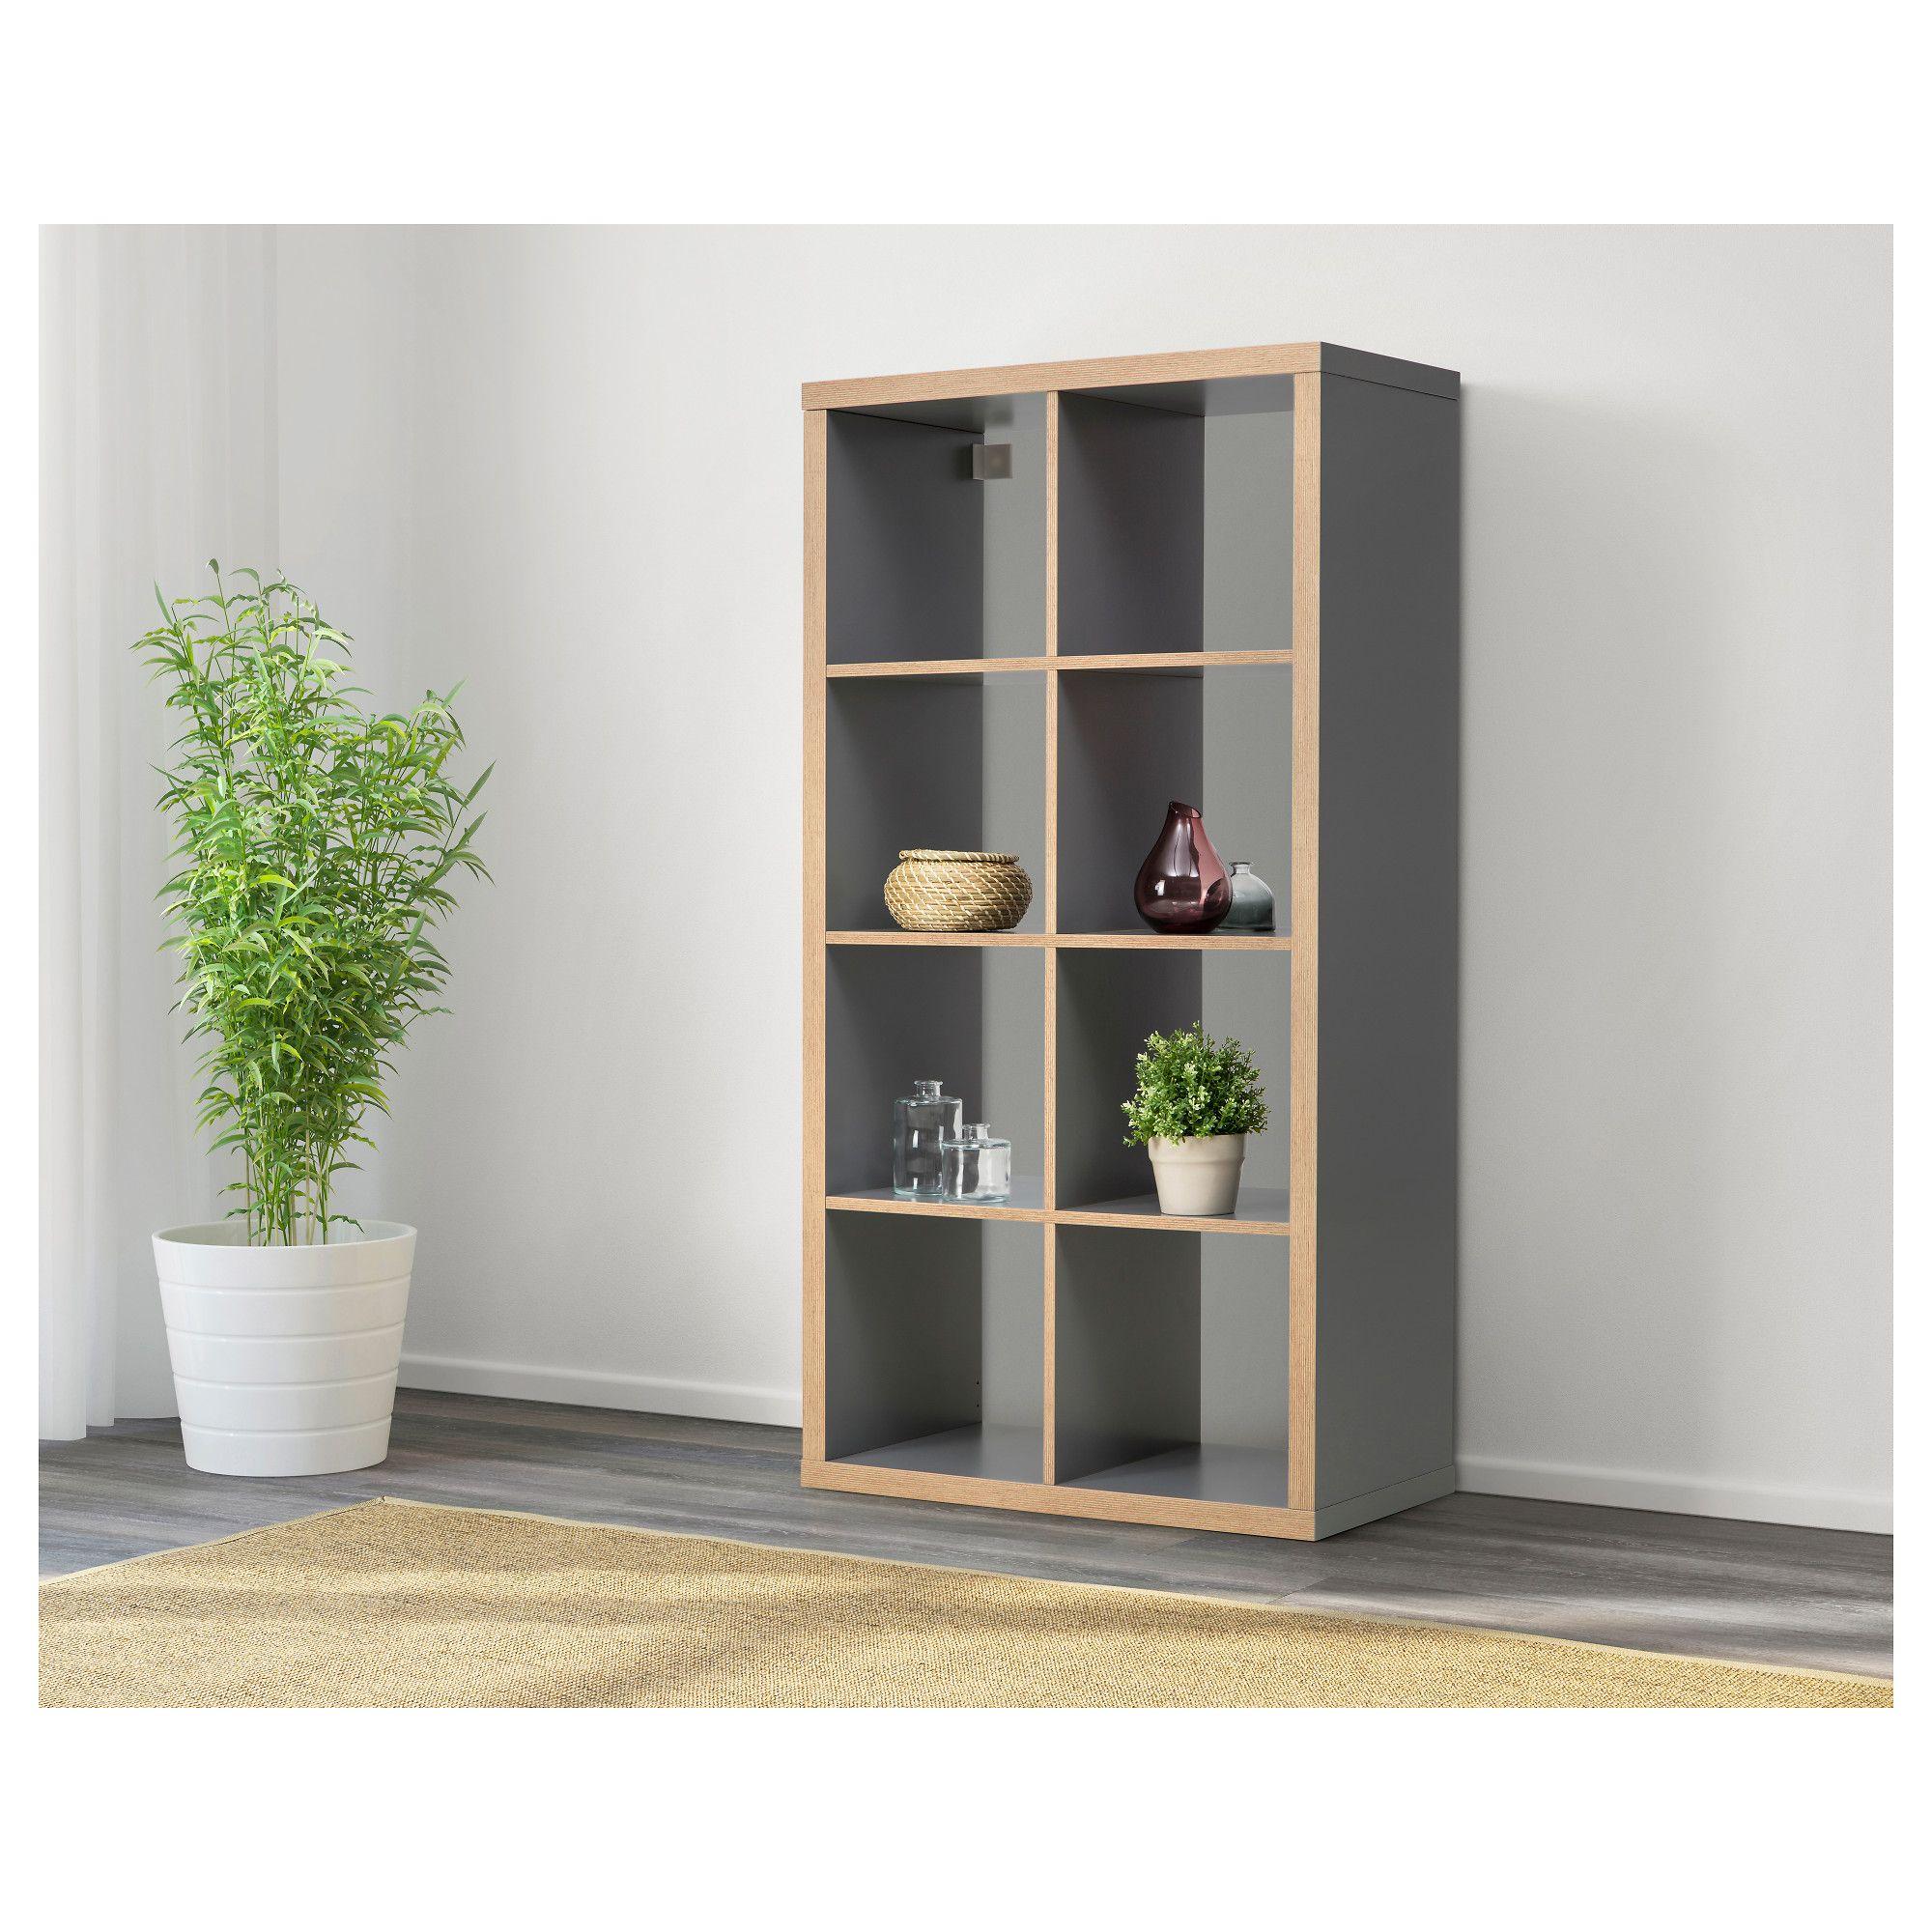 shelf unit kallax gray wood effect jamie room kallax. Black Bedroom Furniture Sets. Home Design Ideas